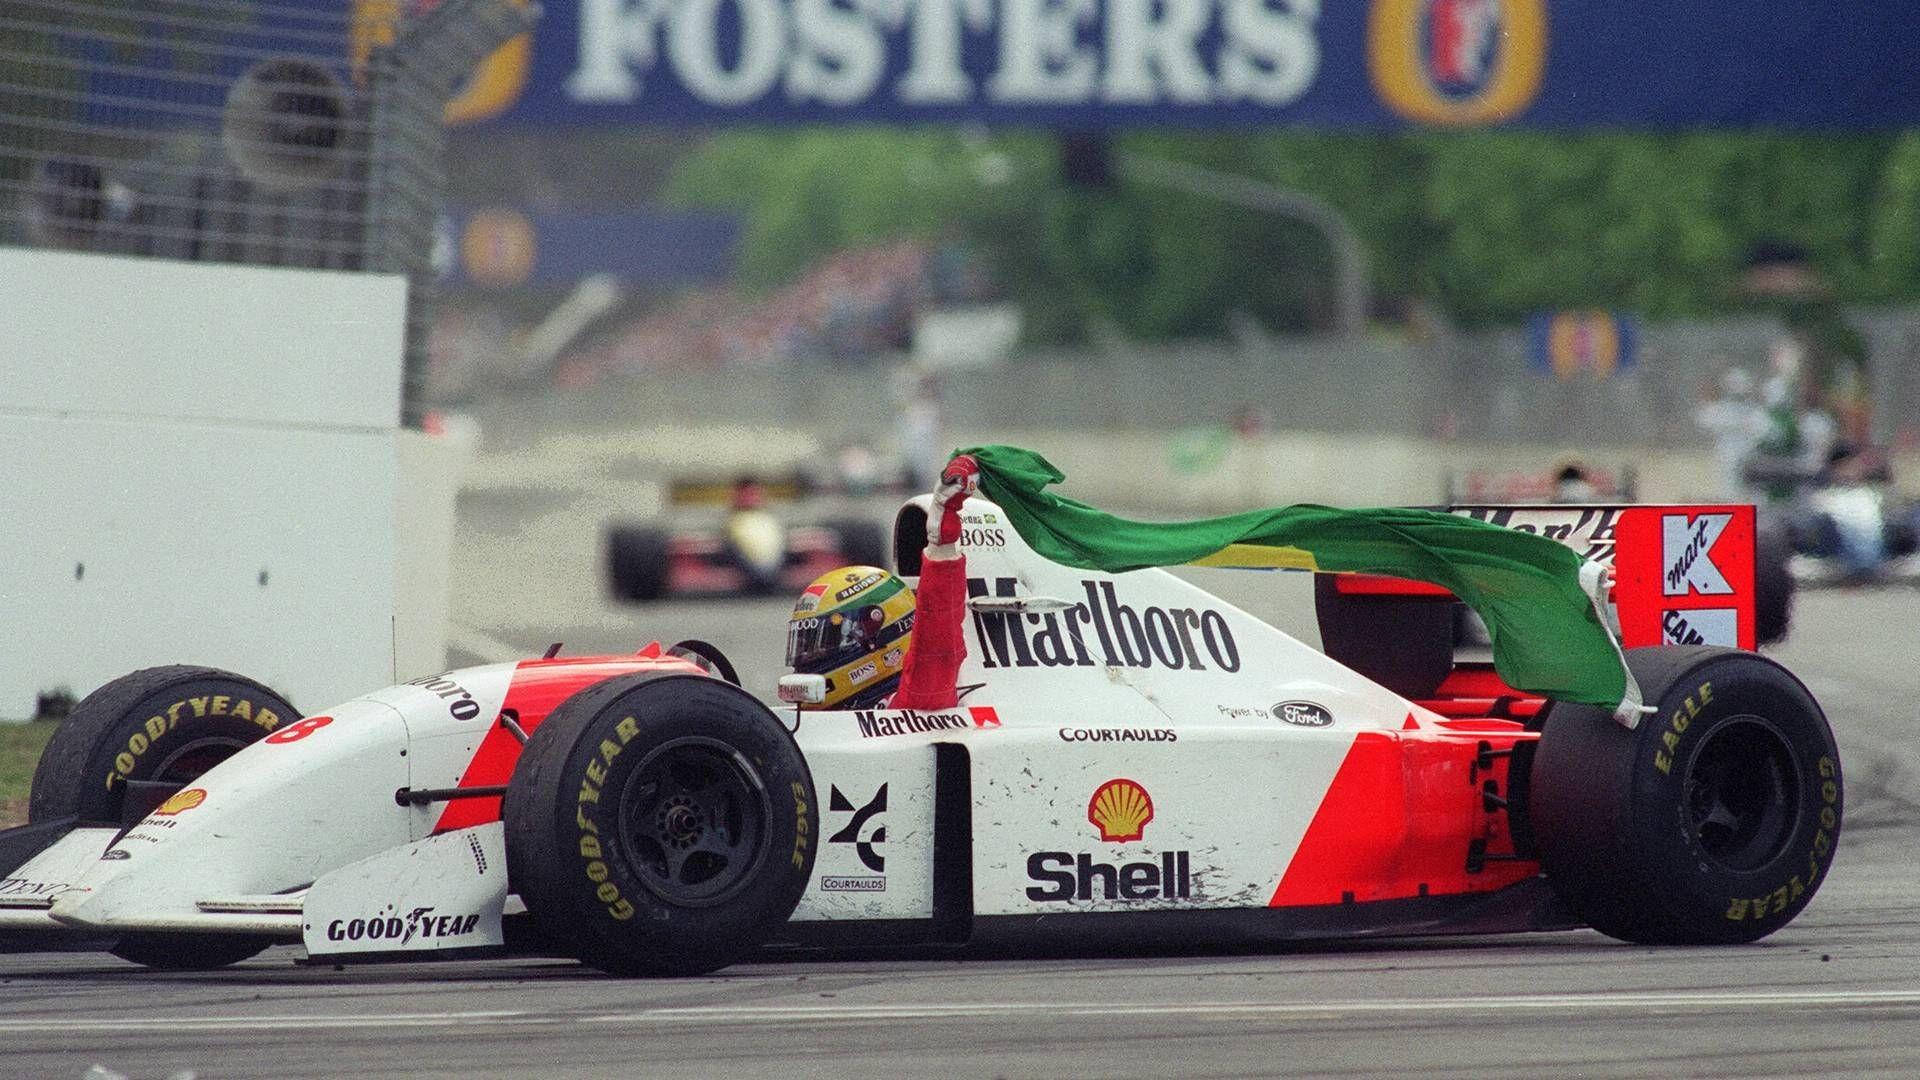 General 1920x1080 Formula 1 McLaren Mclaren Mp4 Marlboro Ayrton Senna helmet Brazil flag sports racing